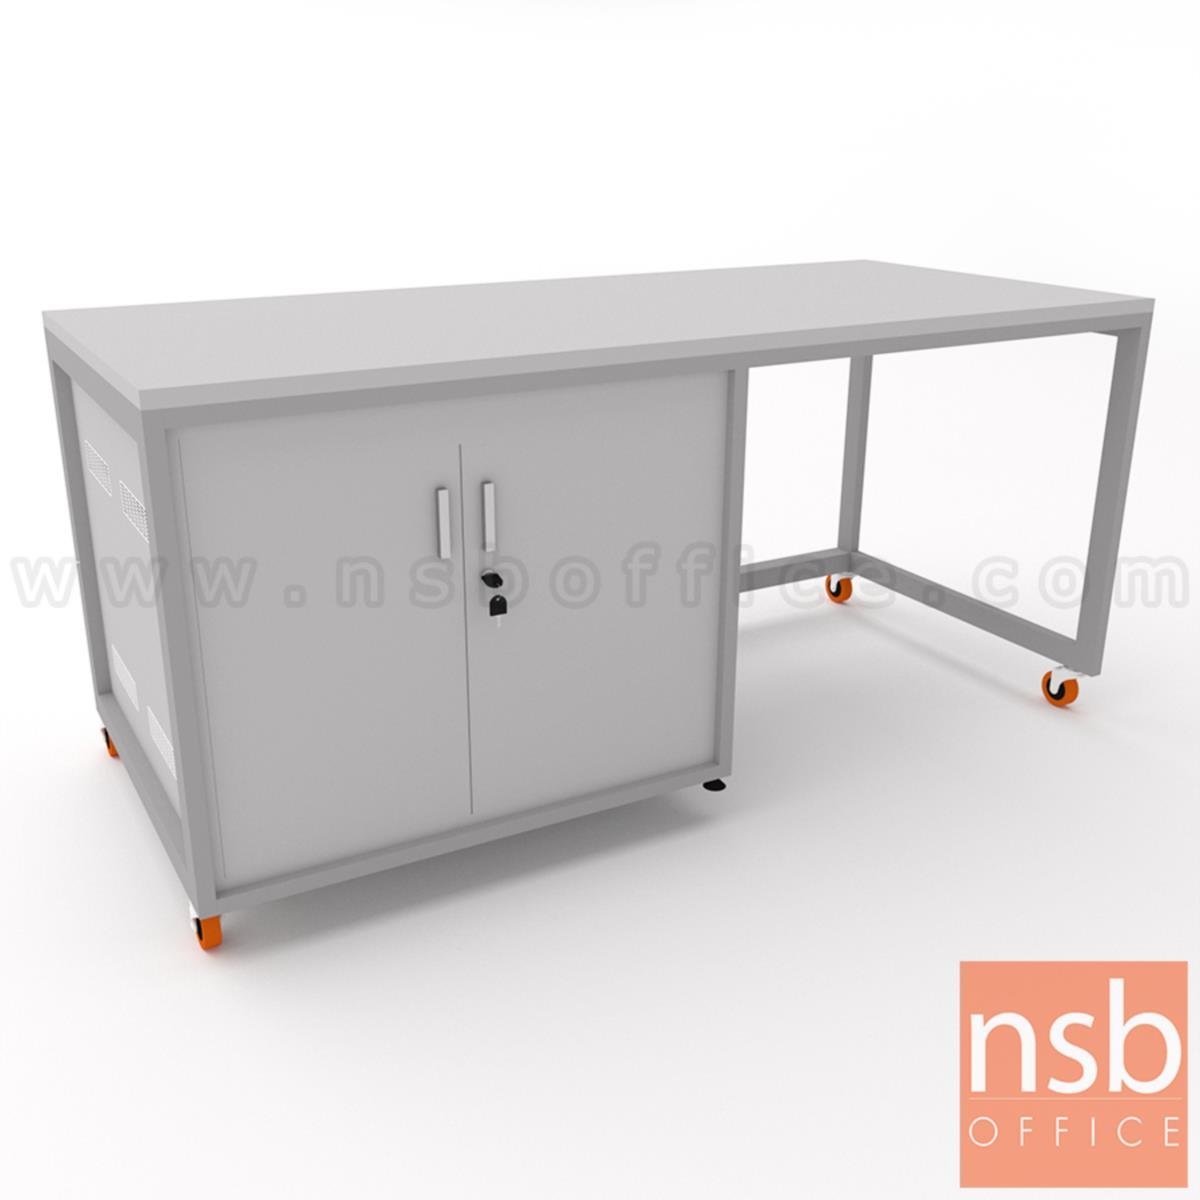 C12A019:ตู้แลปเก็บอุปกรณ์ บานเปิด รุ่น Sinai (ซีนายน์) top HPL ขนาด 150W, 180W cm. ล้อเลื่อน เคลื่อนย้ายได้